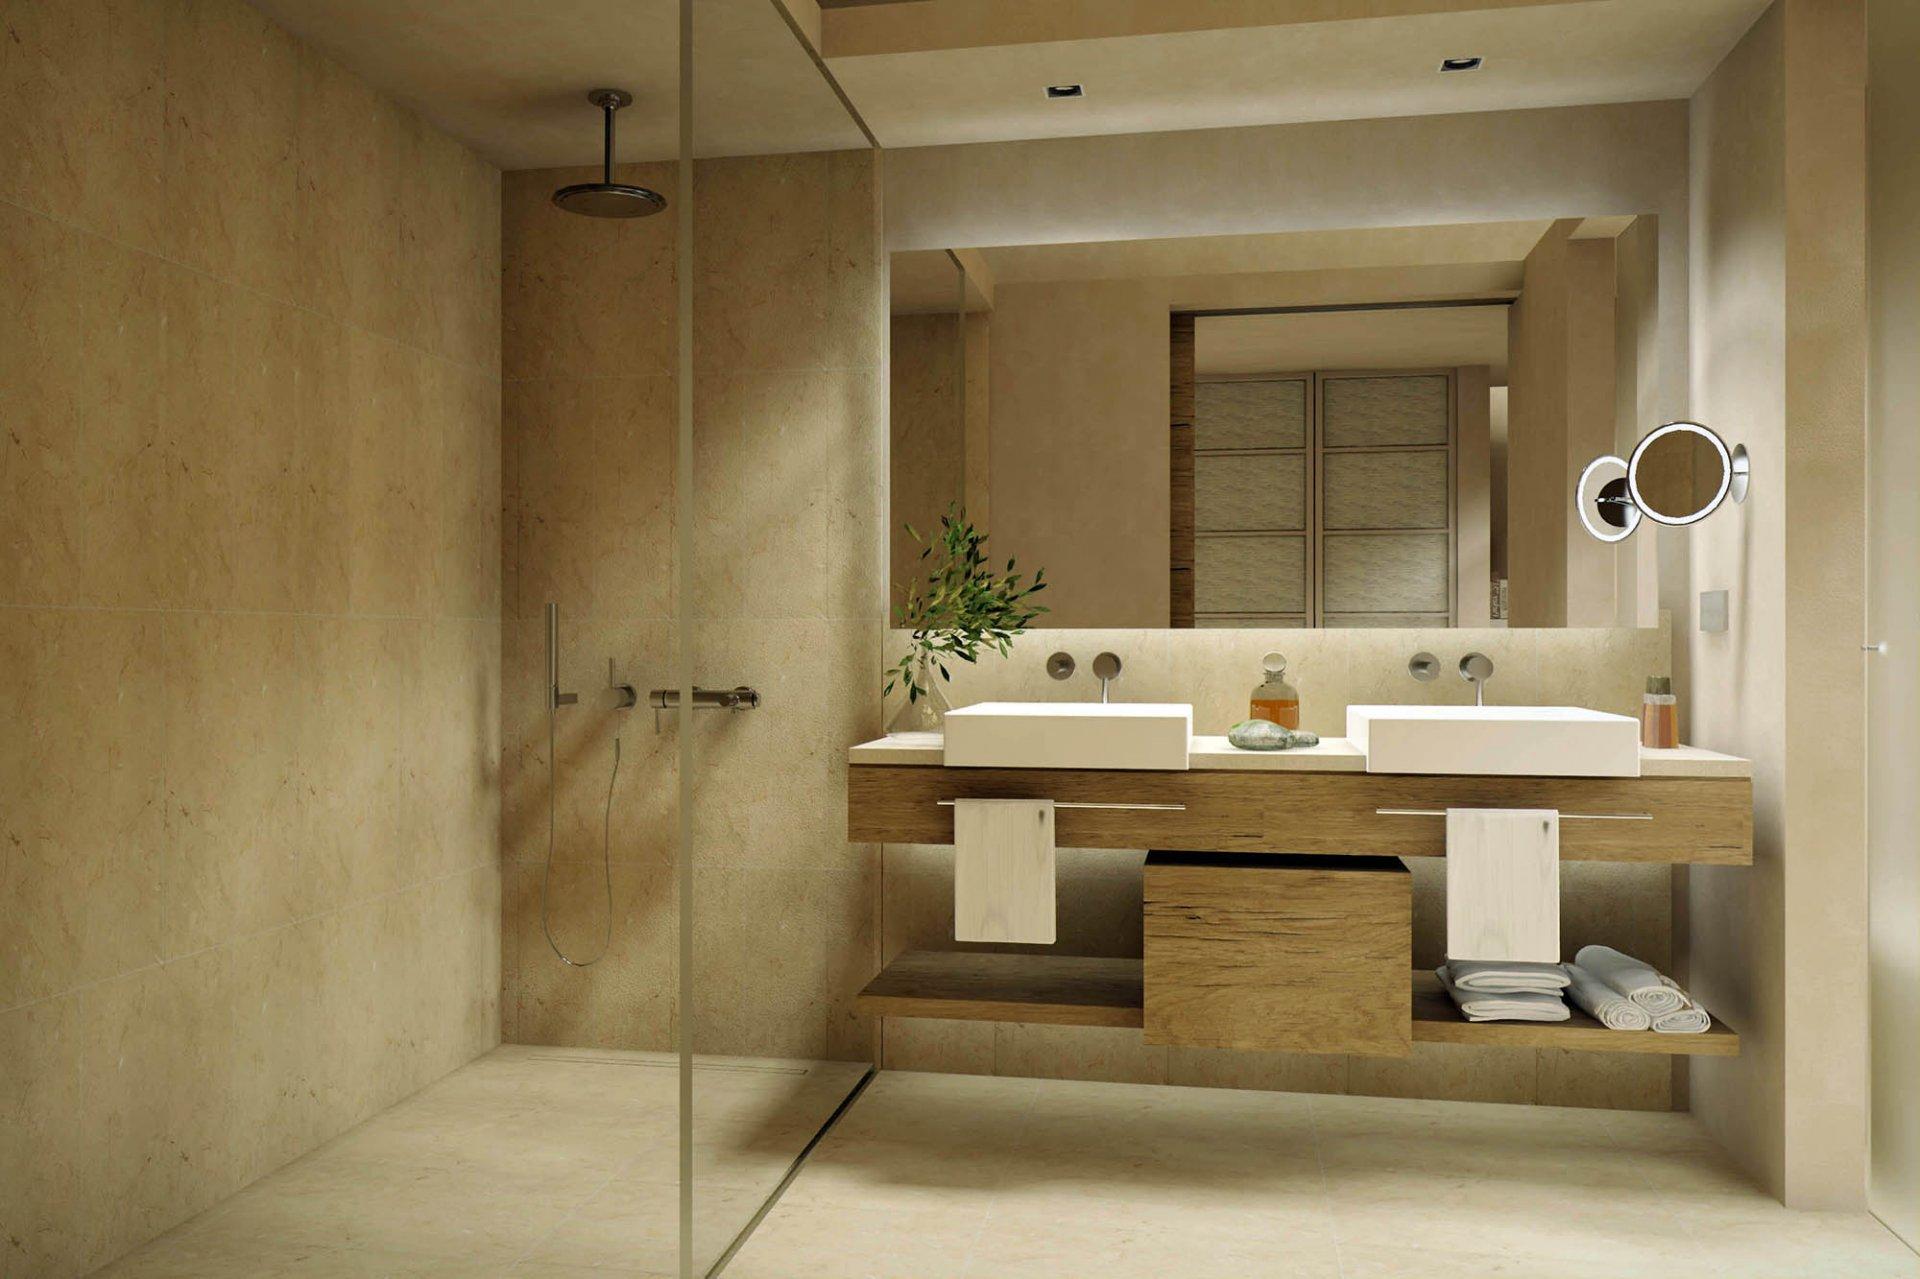 plombier urgent wc lattes allo d bouchage moto scooter marseille occasion moto. Black Bedroom Furniture Sets. Home Design Ideas